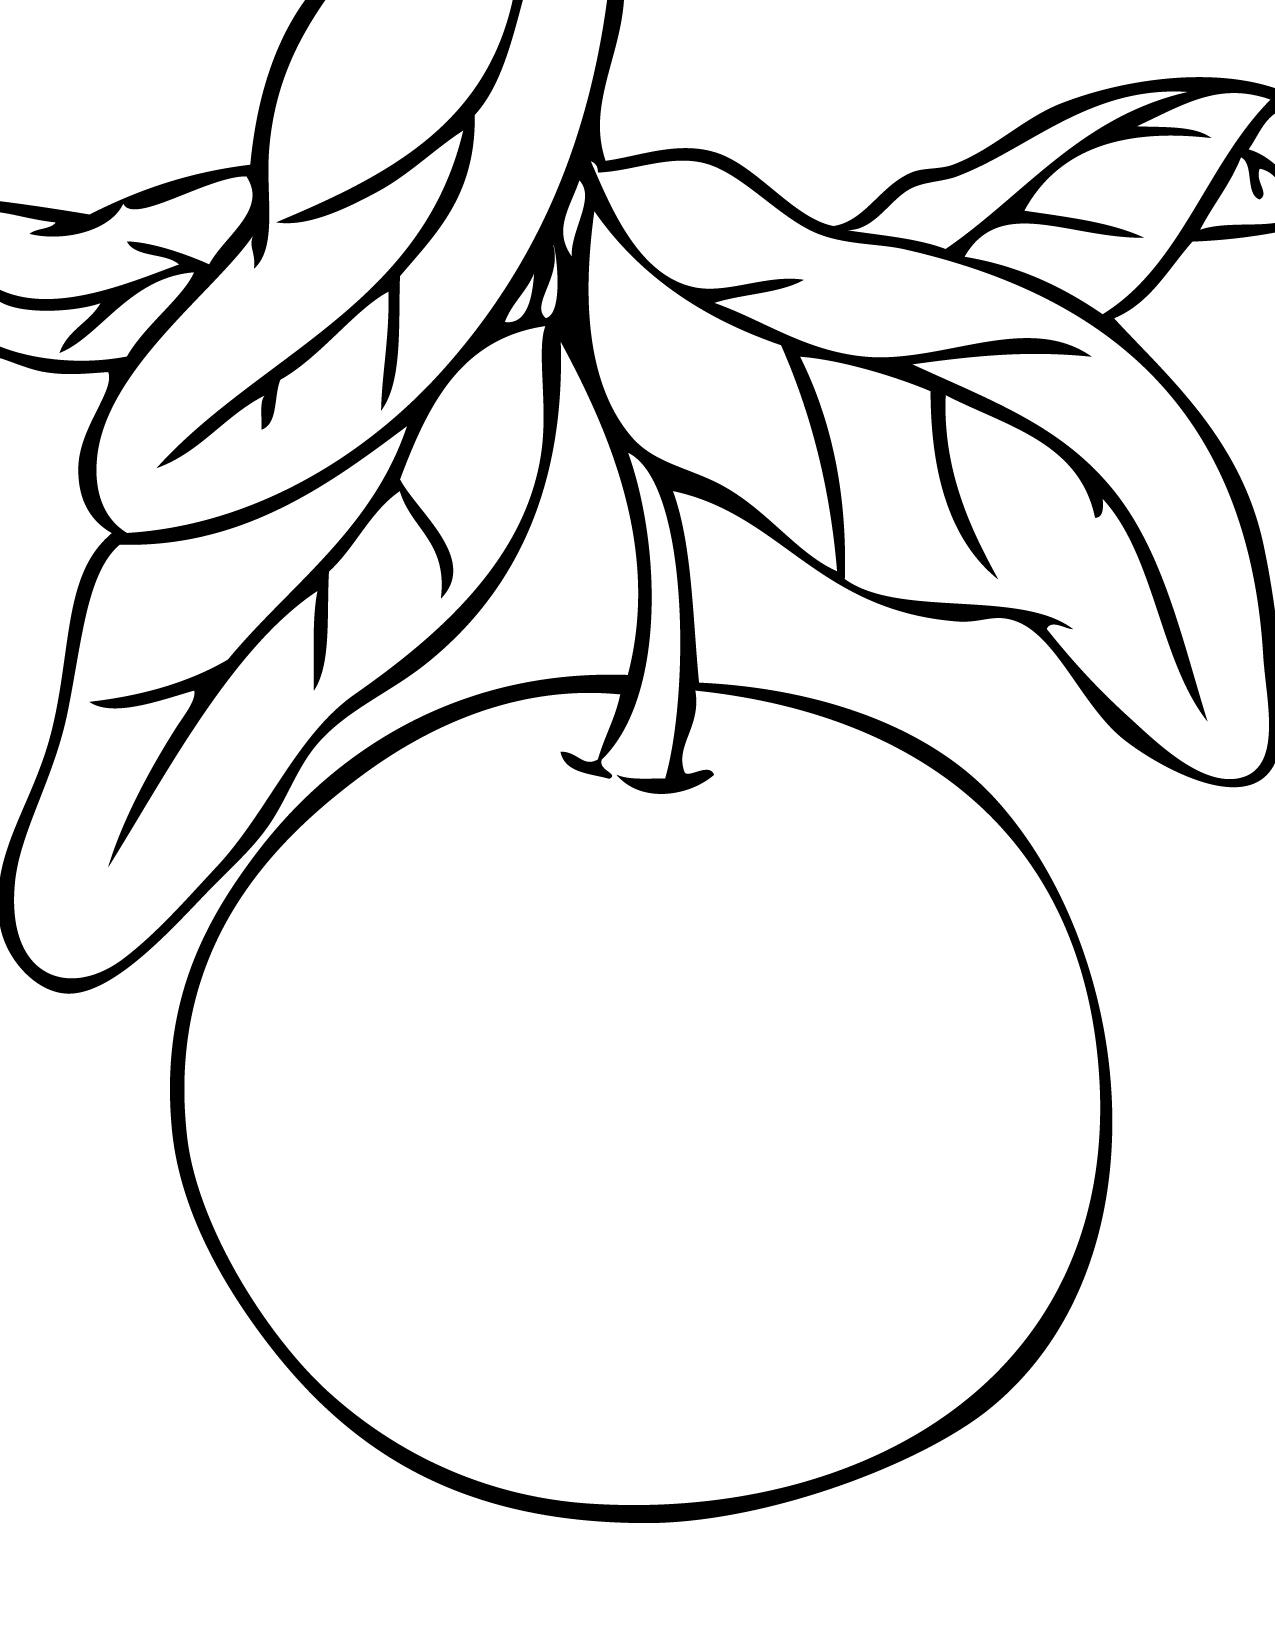 1275x1650 Fresh Grapefruit Coloring Pages Design Printable Coloring Sheet